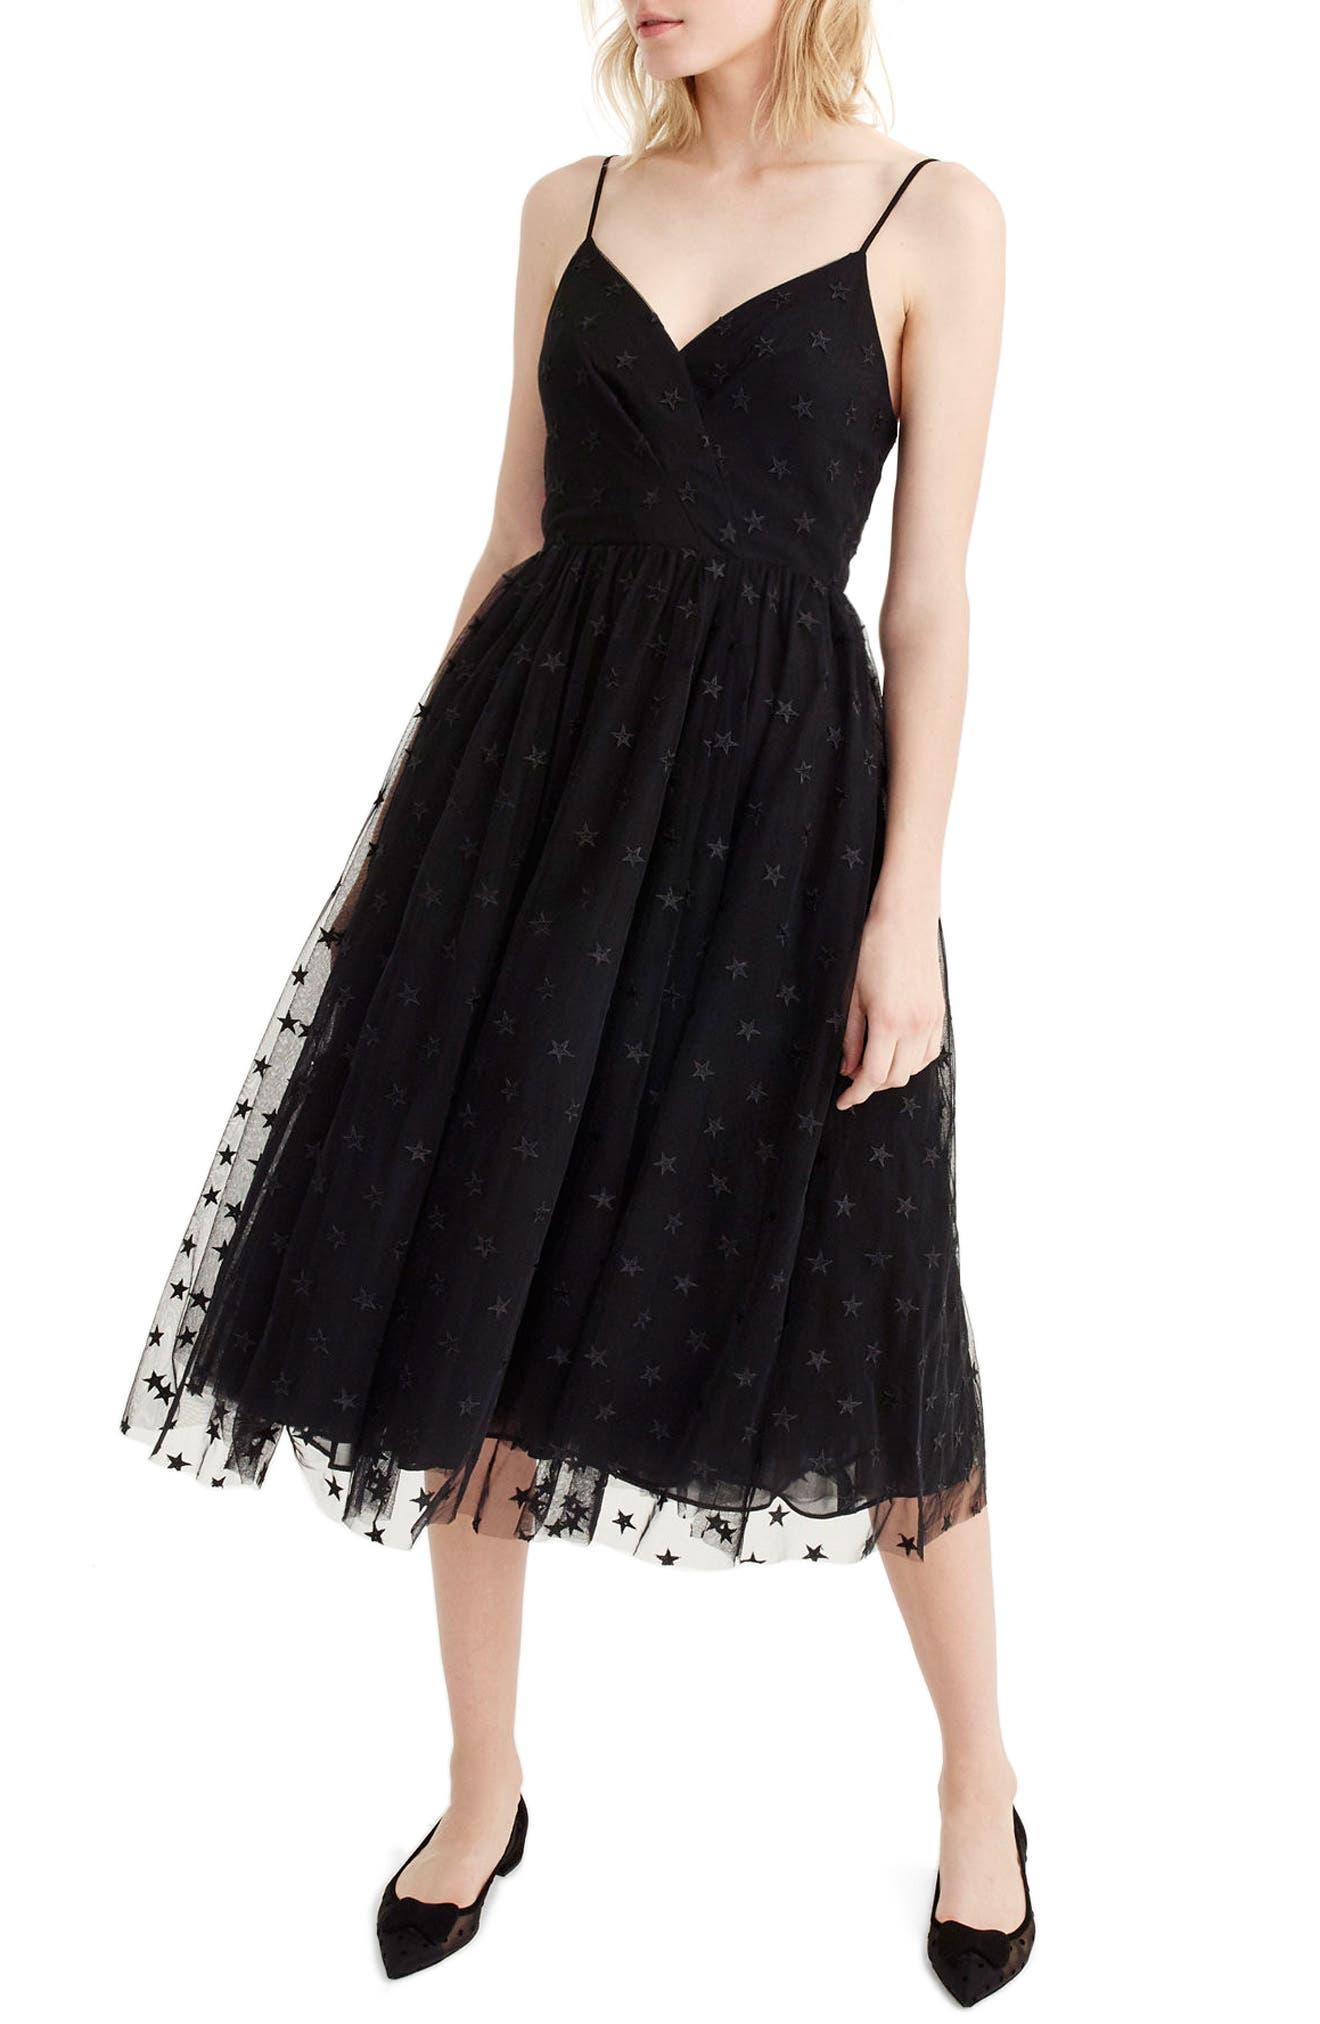 Alternate Image 1 Selected - J.Crew Spaghetti Strap Star Tulle Dress (Regular & Petite)